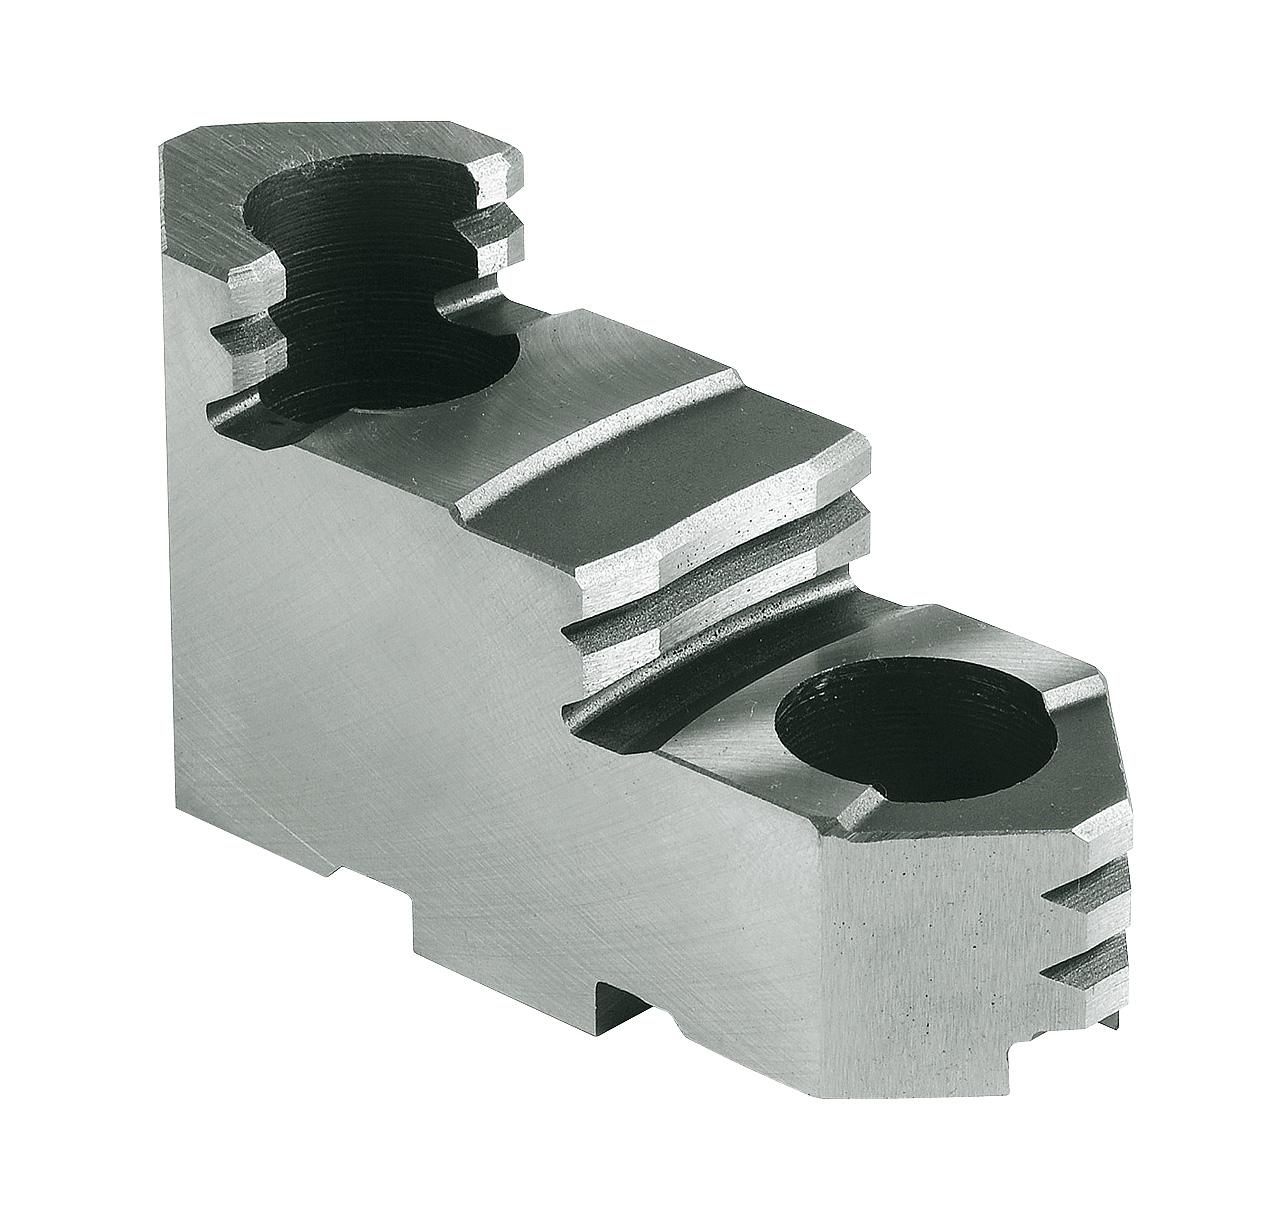 Szczęki górne twarde - komplet DTJ-DK11-250 BERNARDO